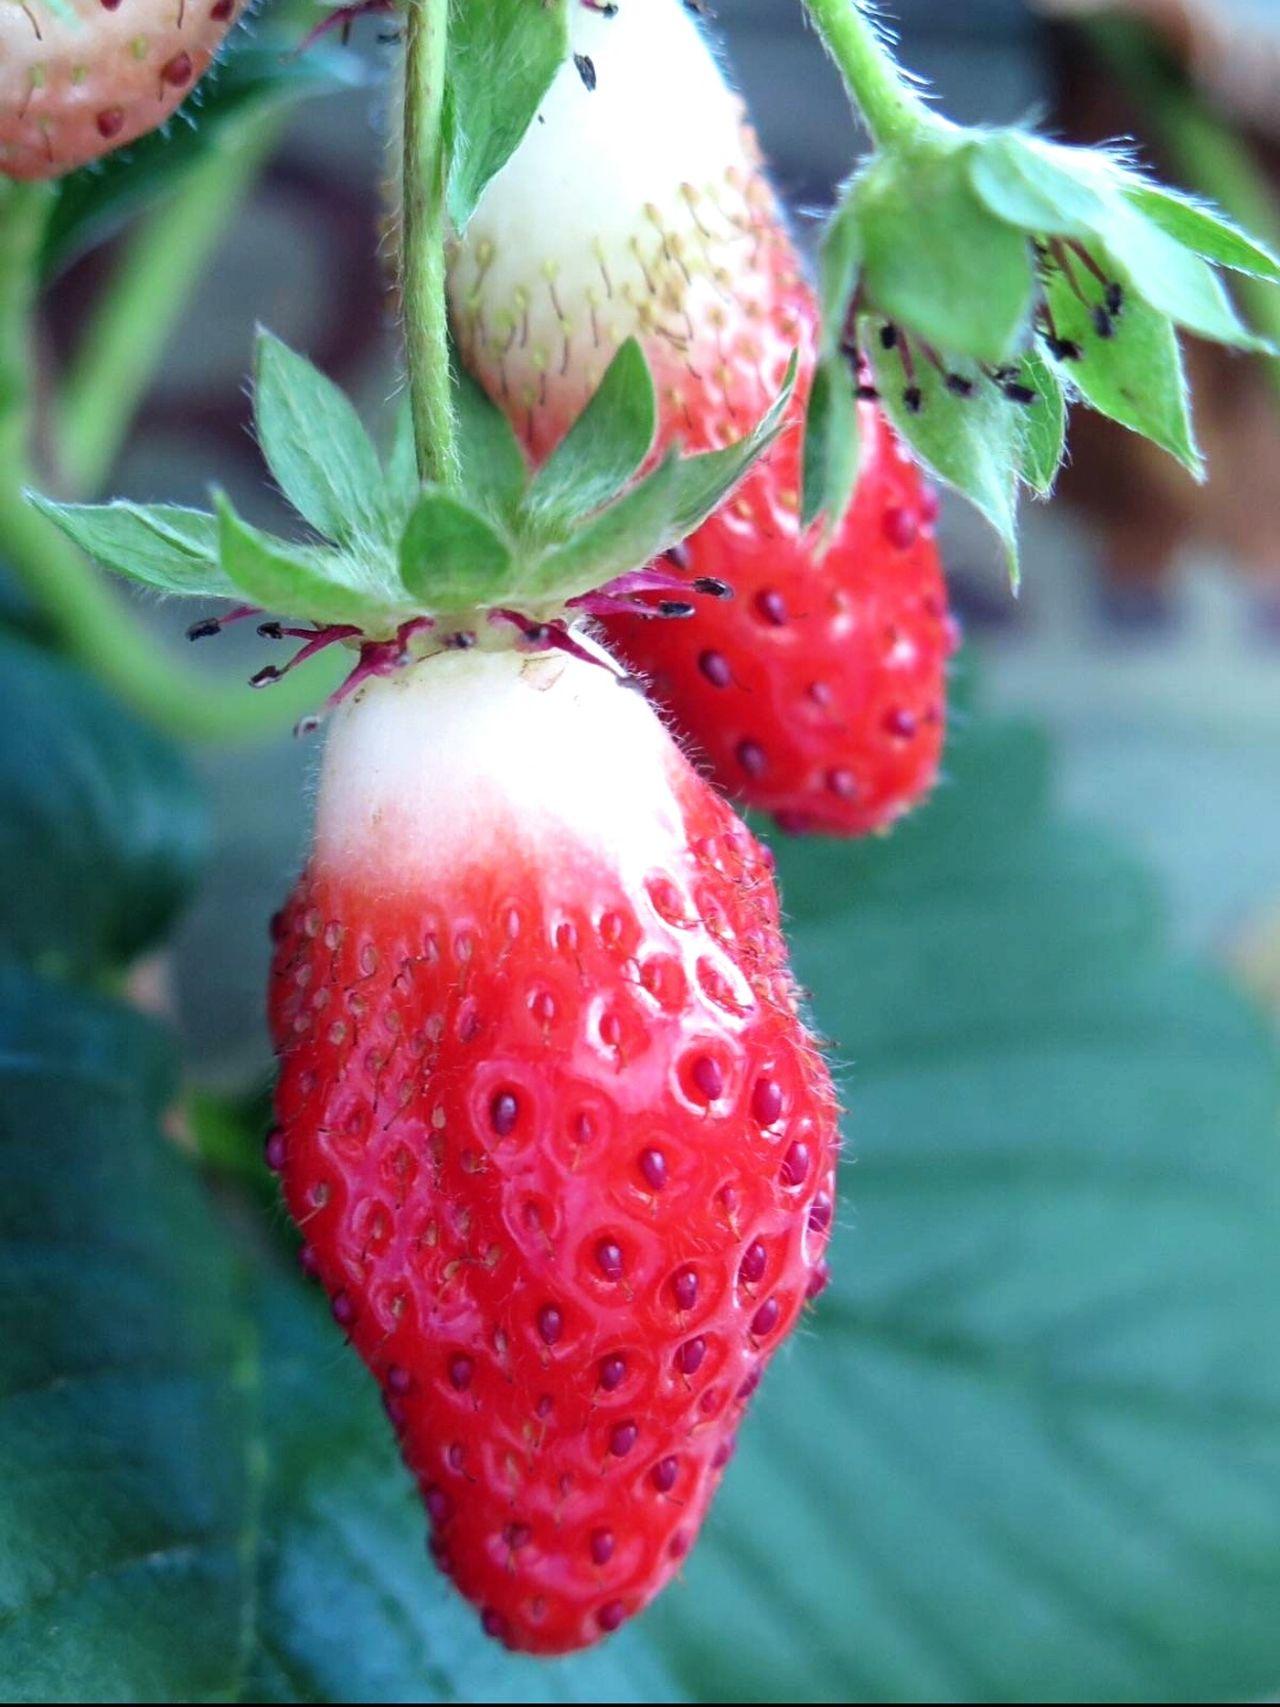 Strawberrys Fruits Sweet Tasting Beautiful Nature Nature Photography